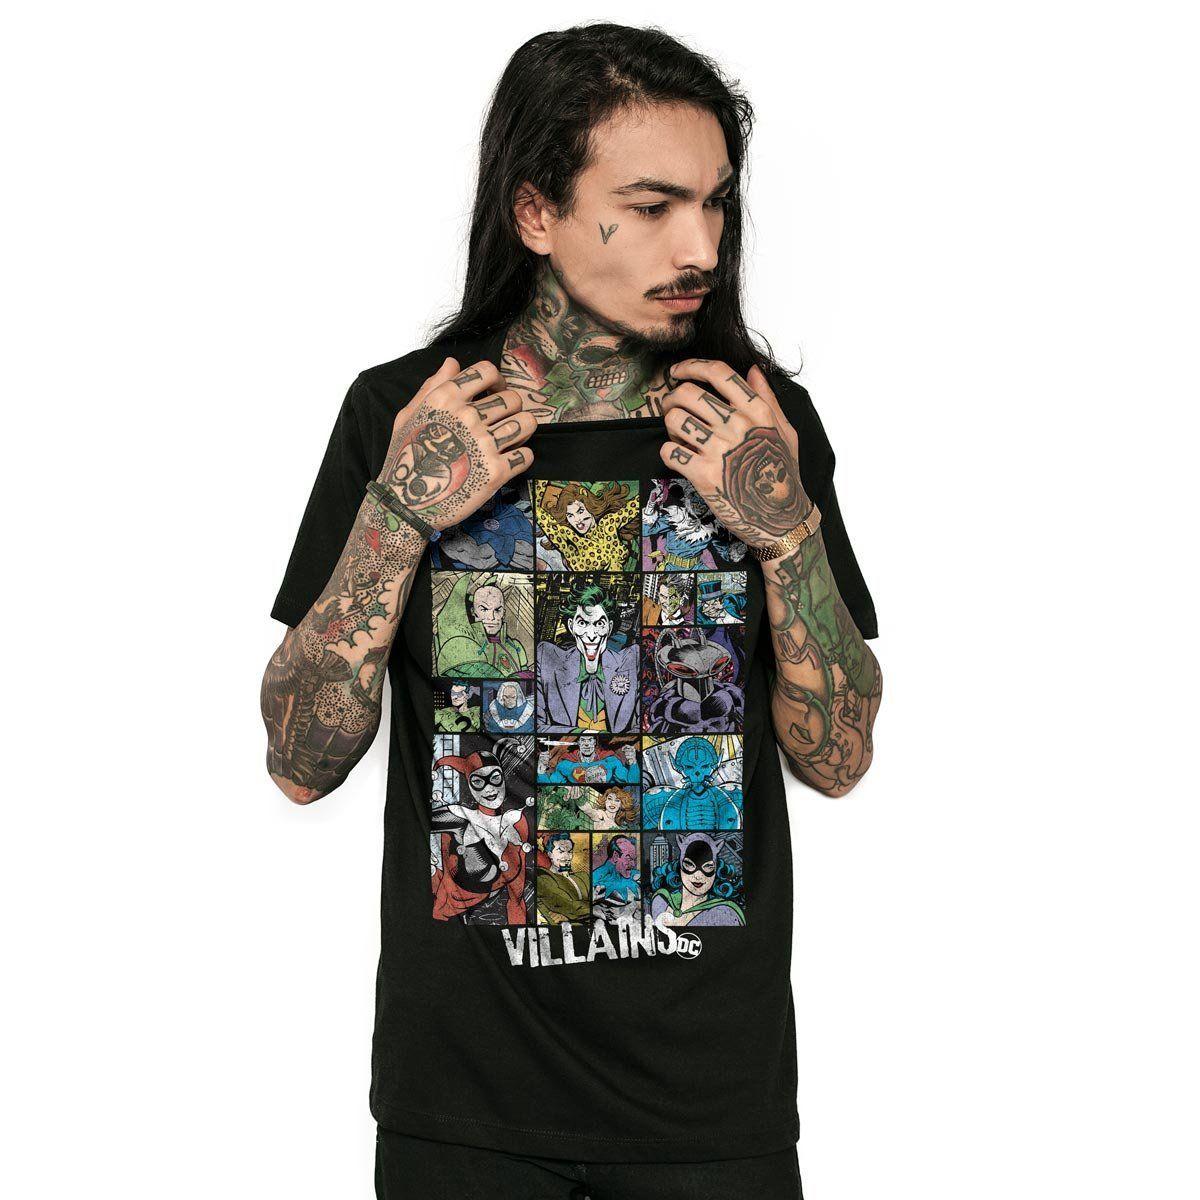 Camiseta Masculina DC Comics Villains Oficial  - bandUP Store Marketplace